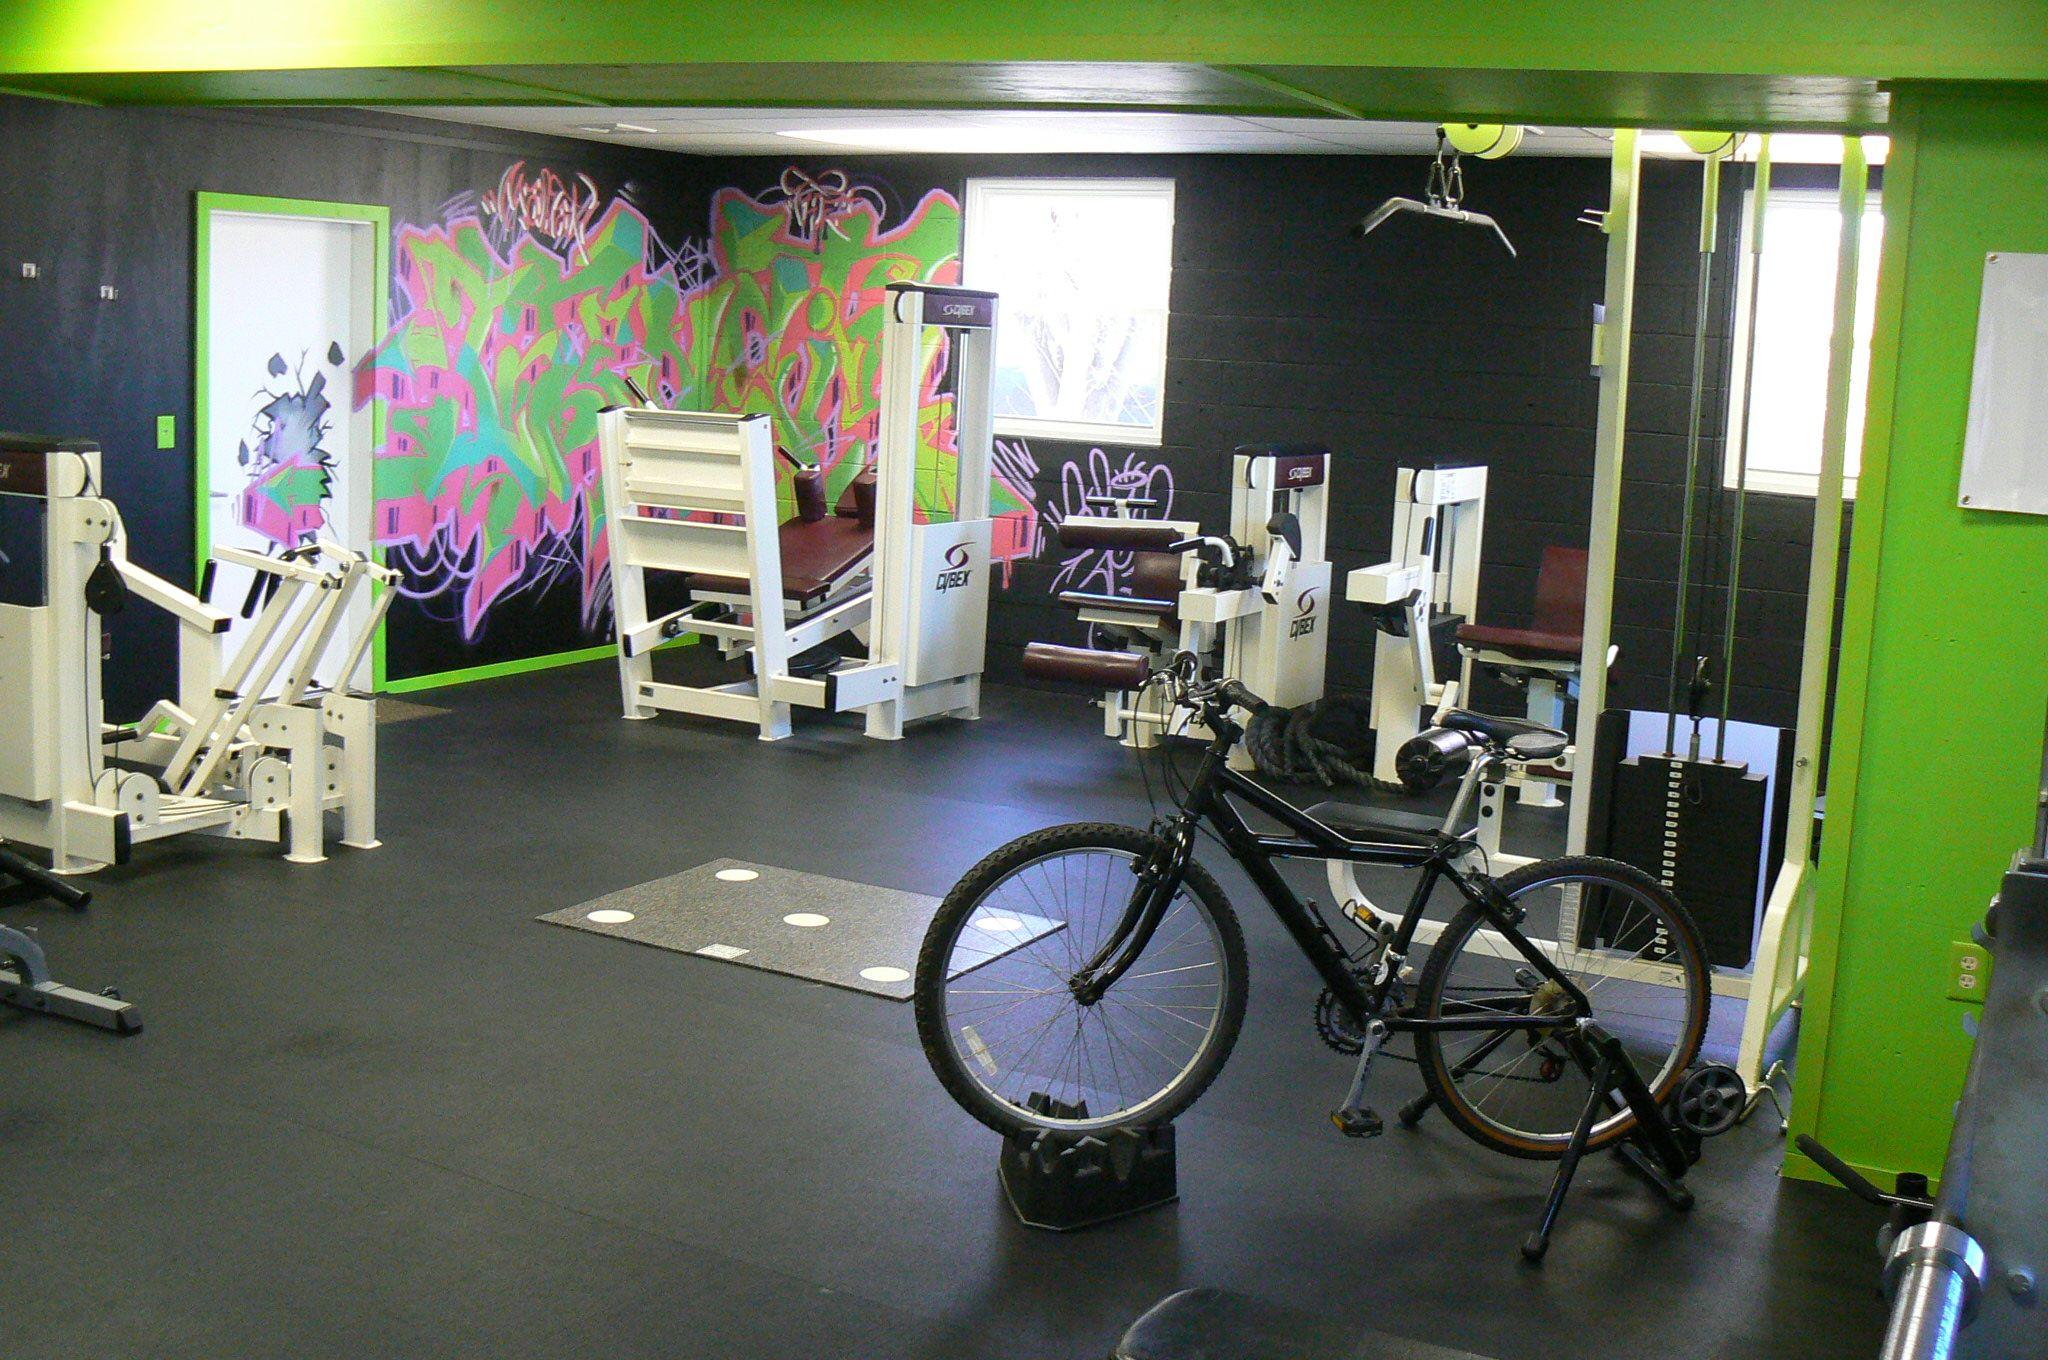 Private Fitness Studio Fitness Studio Fitness Healthy Lifestyle